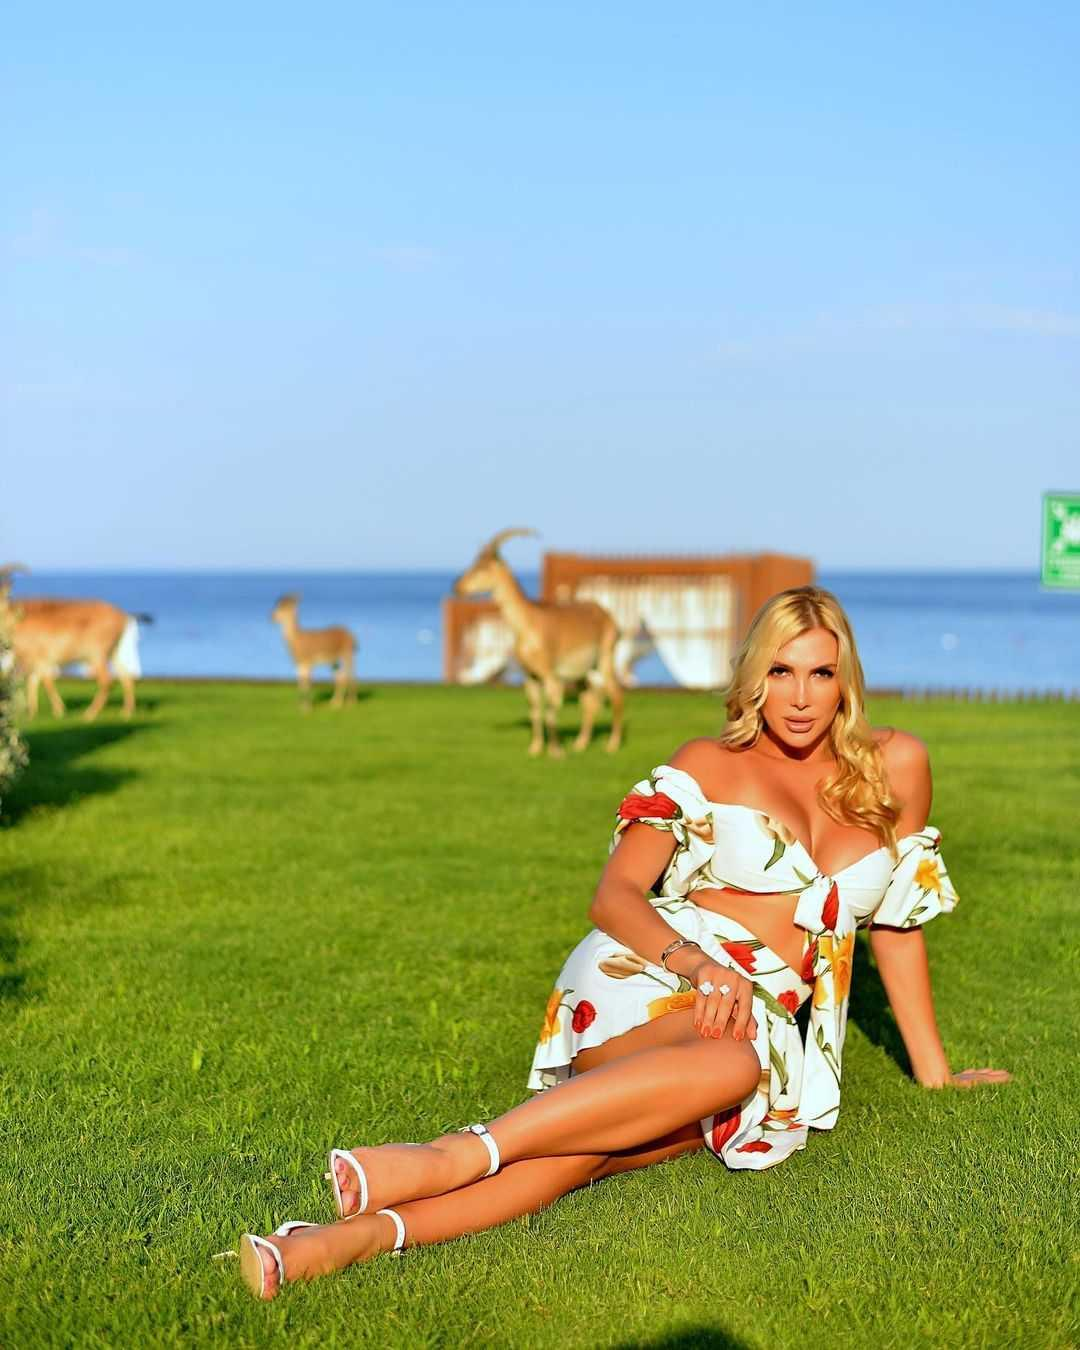 Ганні Гомоновій-35 / instagram.com/anna_gomonova_official